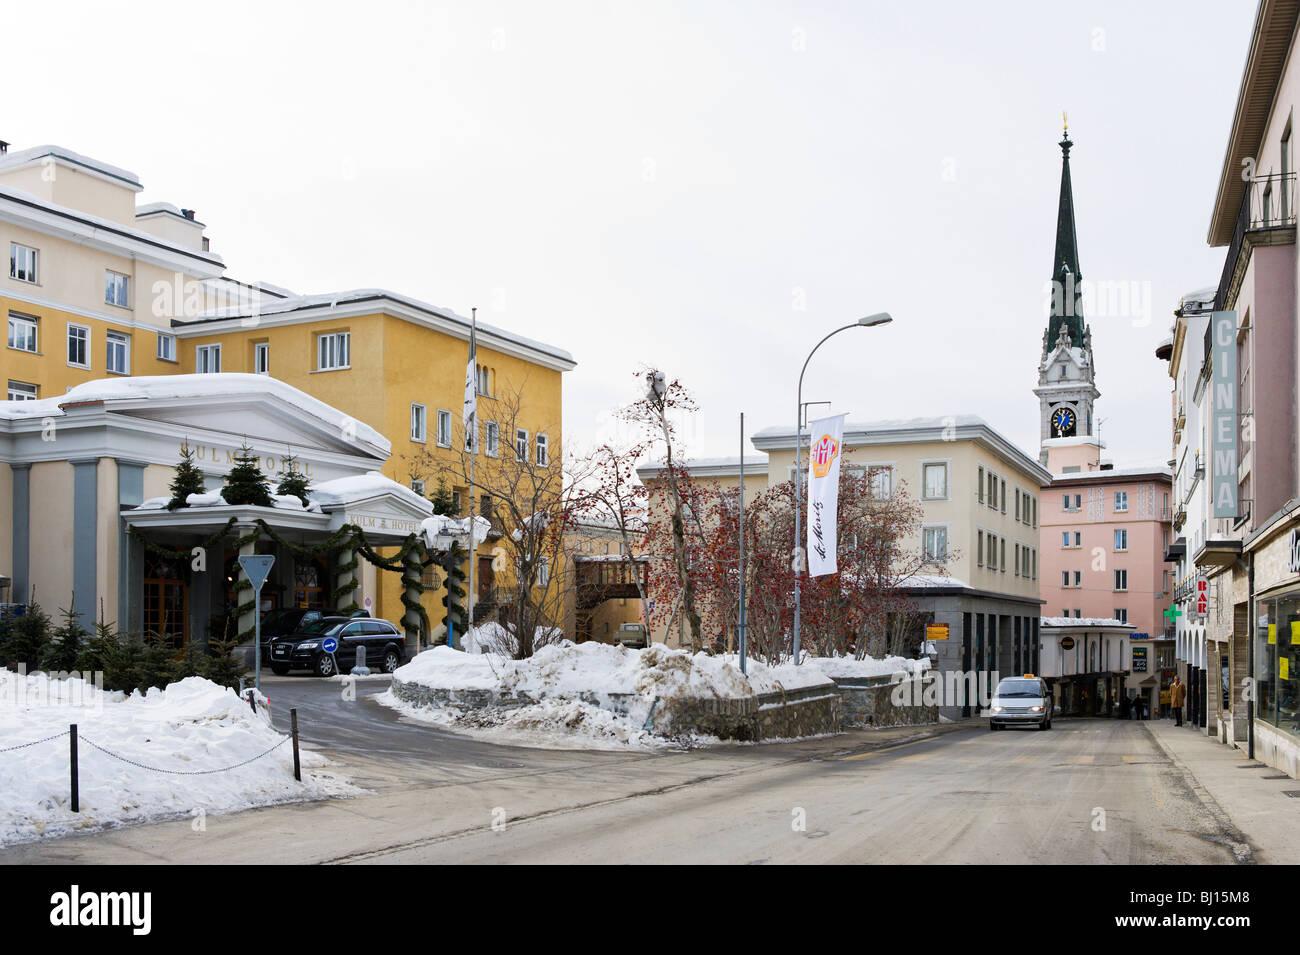 Hotel Kulm and shops in the centre of St Moritz Dorf, St Moritz, Switzerland - Stock Image